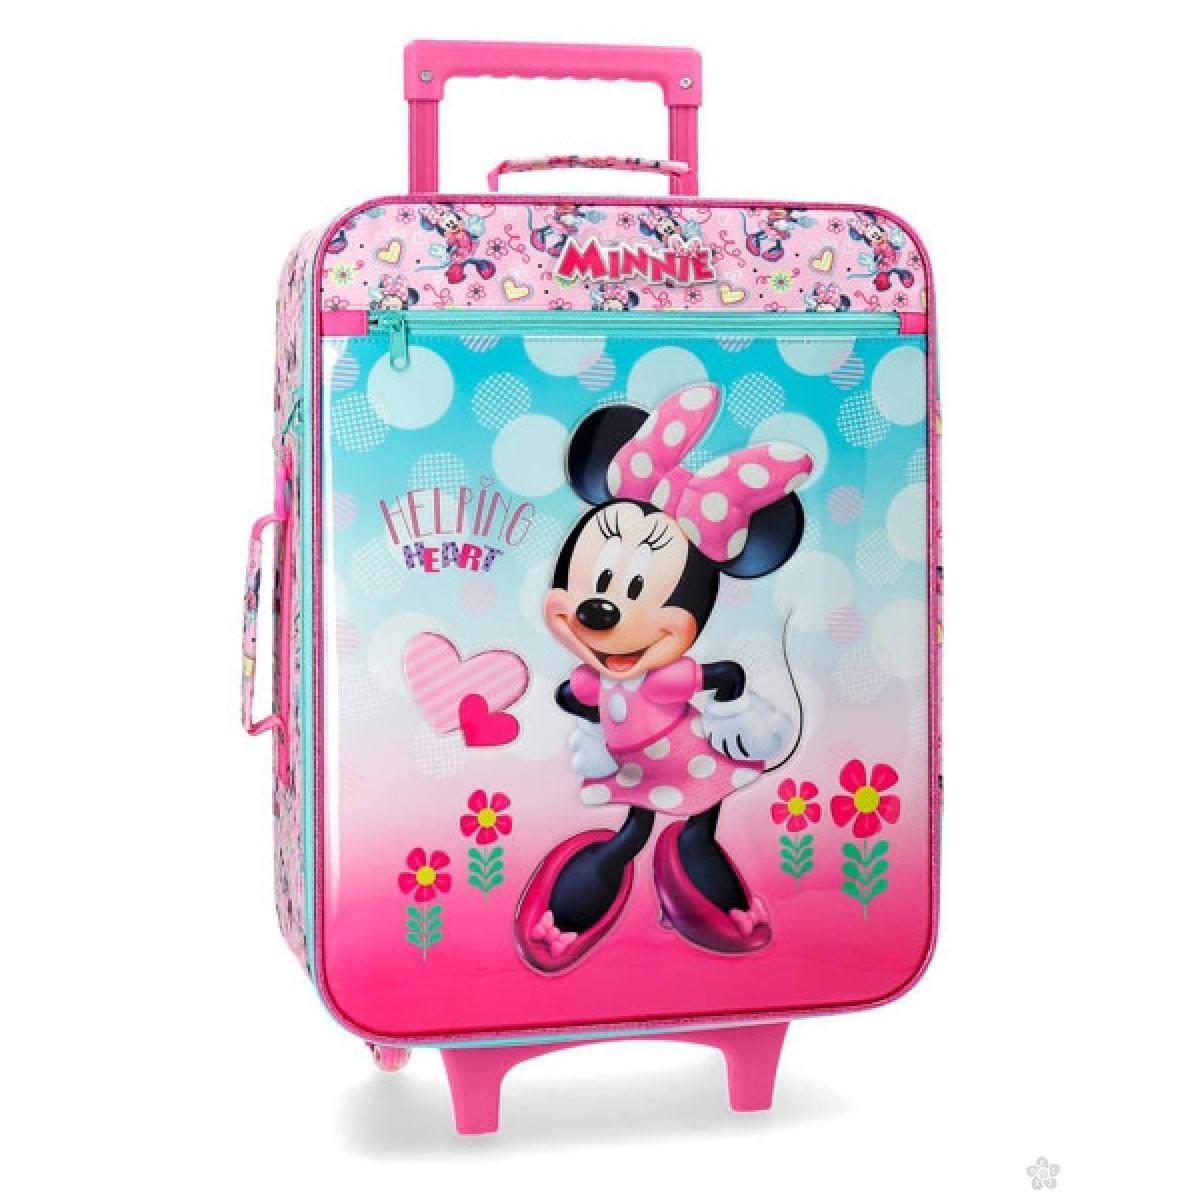 Kofer World Minnie Mouse Heart  50cm,  23.790.61